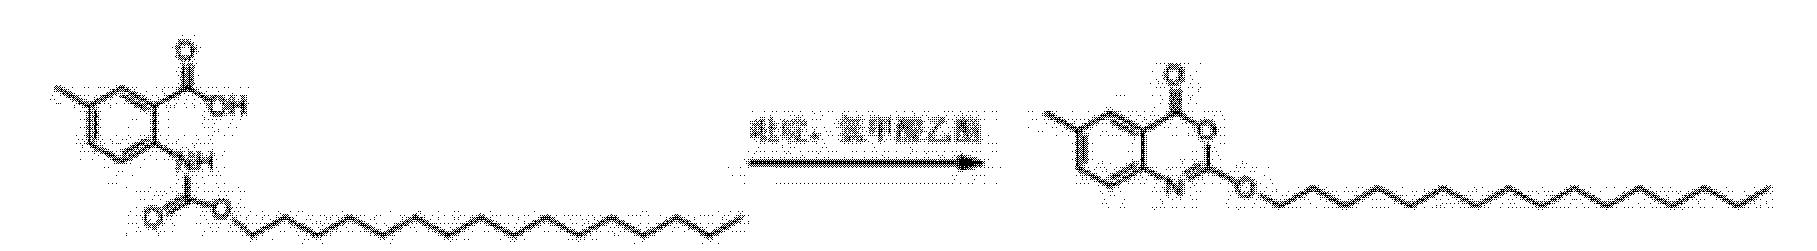 Figure CN104341370AD00113